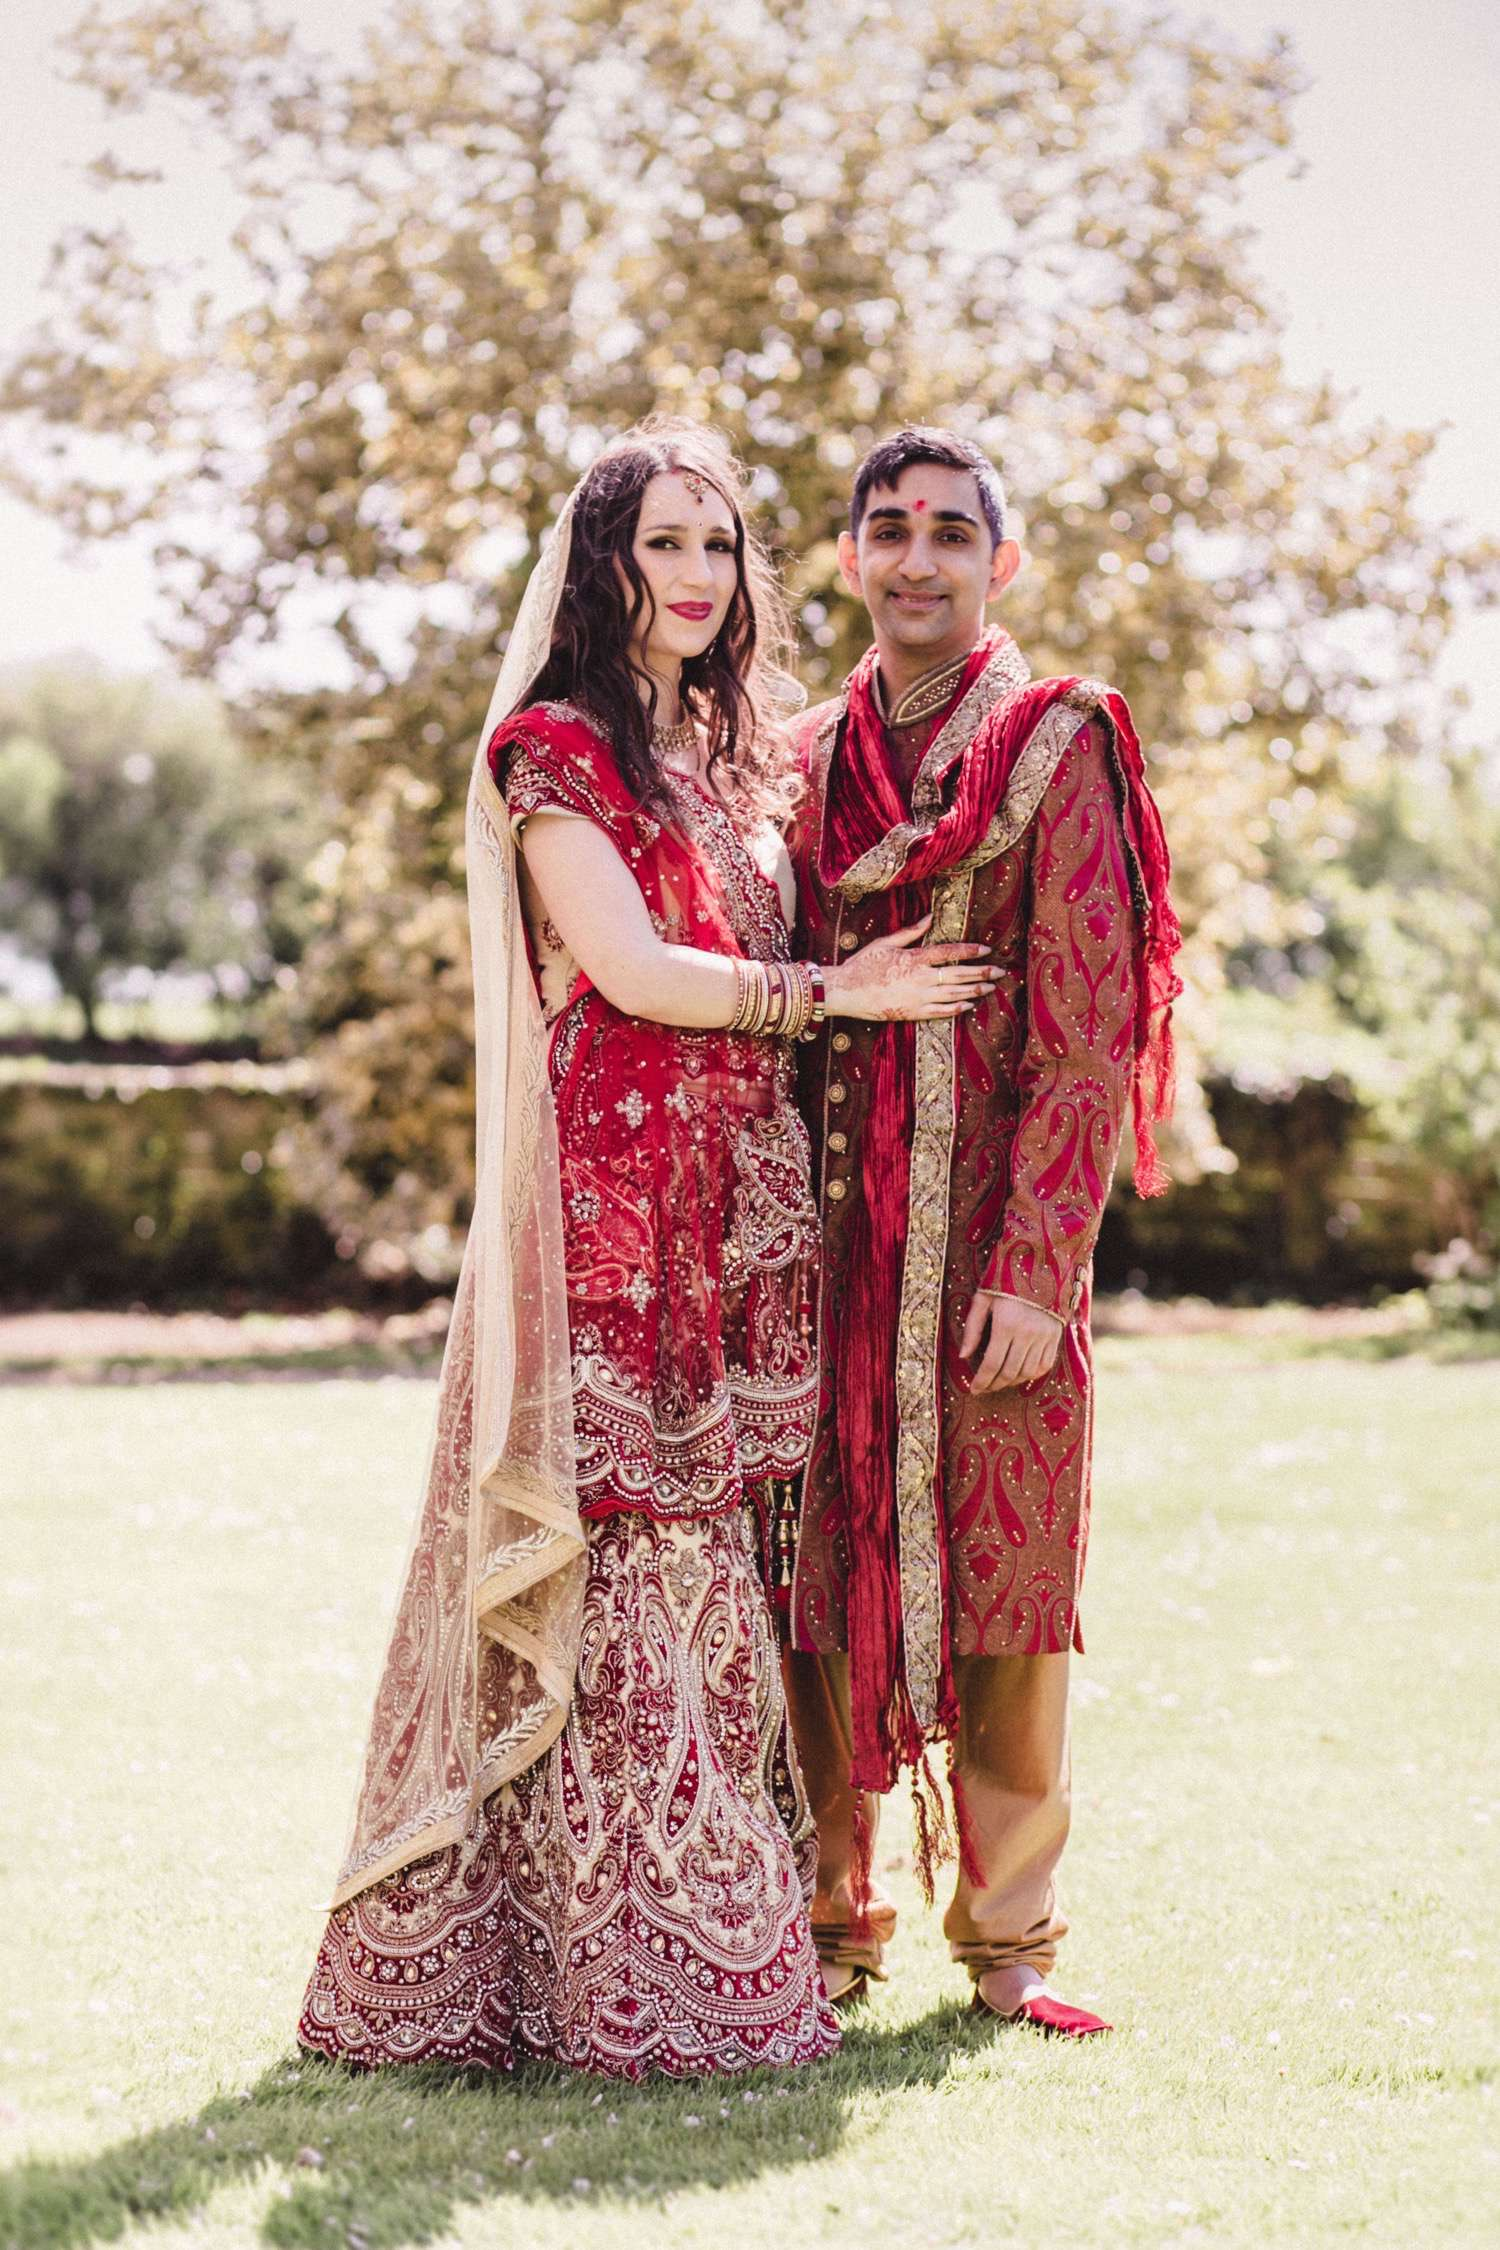 Hindu-Wedding-Photography-Paul-Liddement-Wedding-Stories-36.jpg